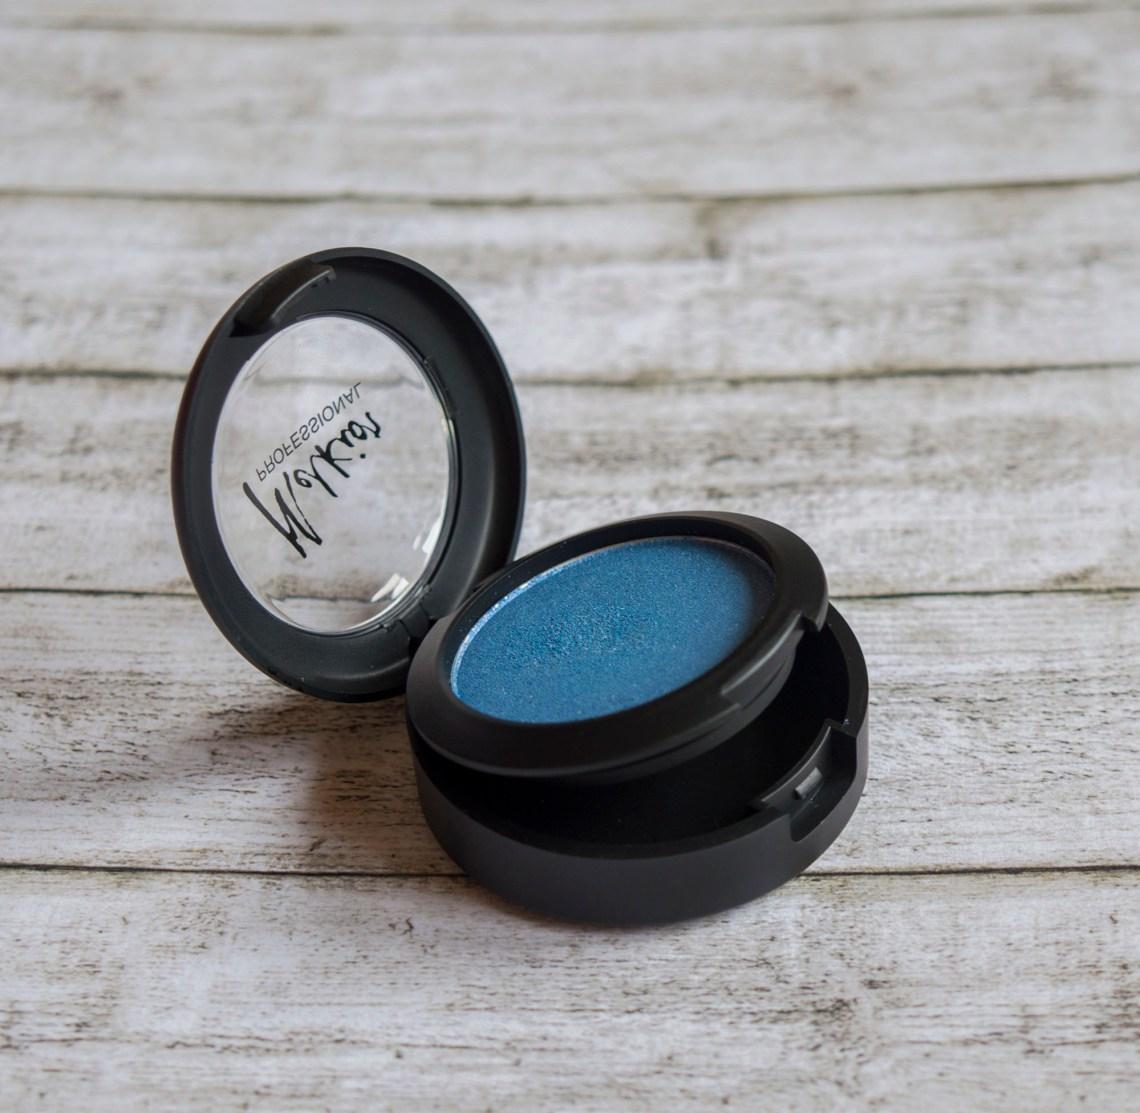 Melkior Professional Cosmetics Make-up First Impressions - Mono Eyeshadow Ciel